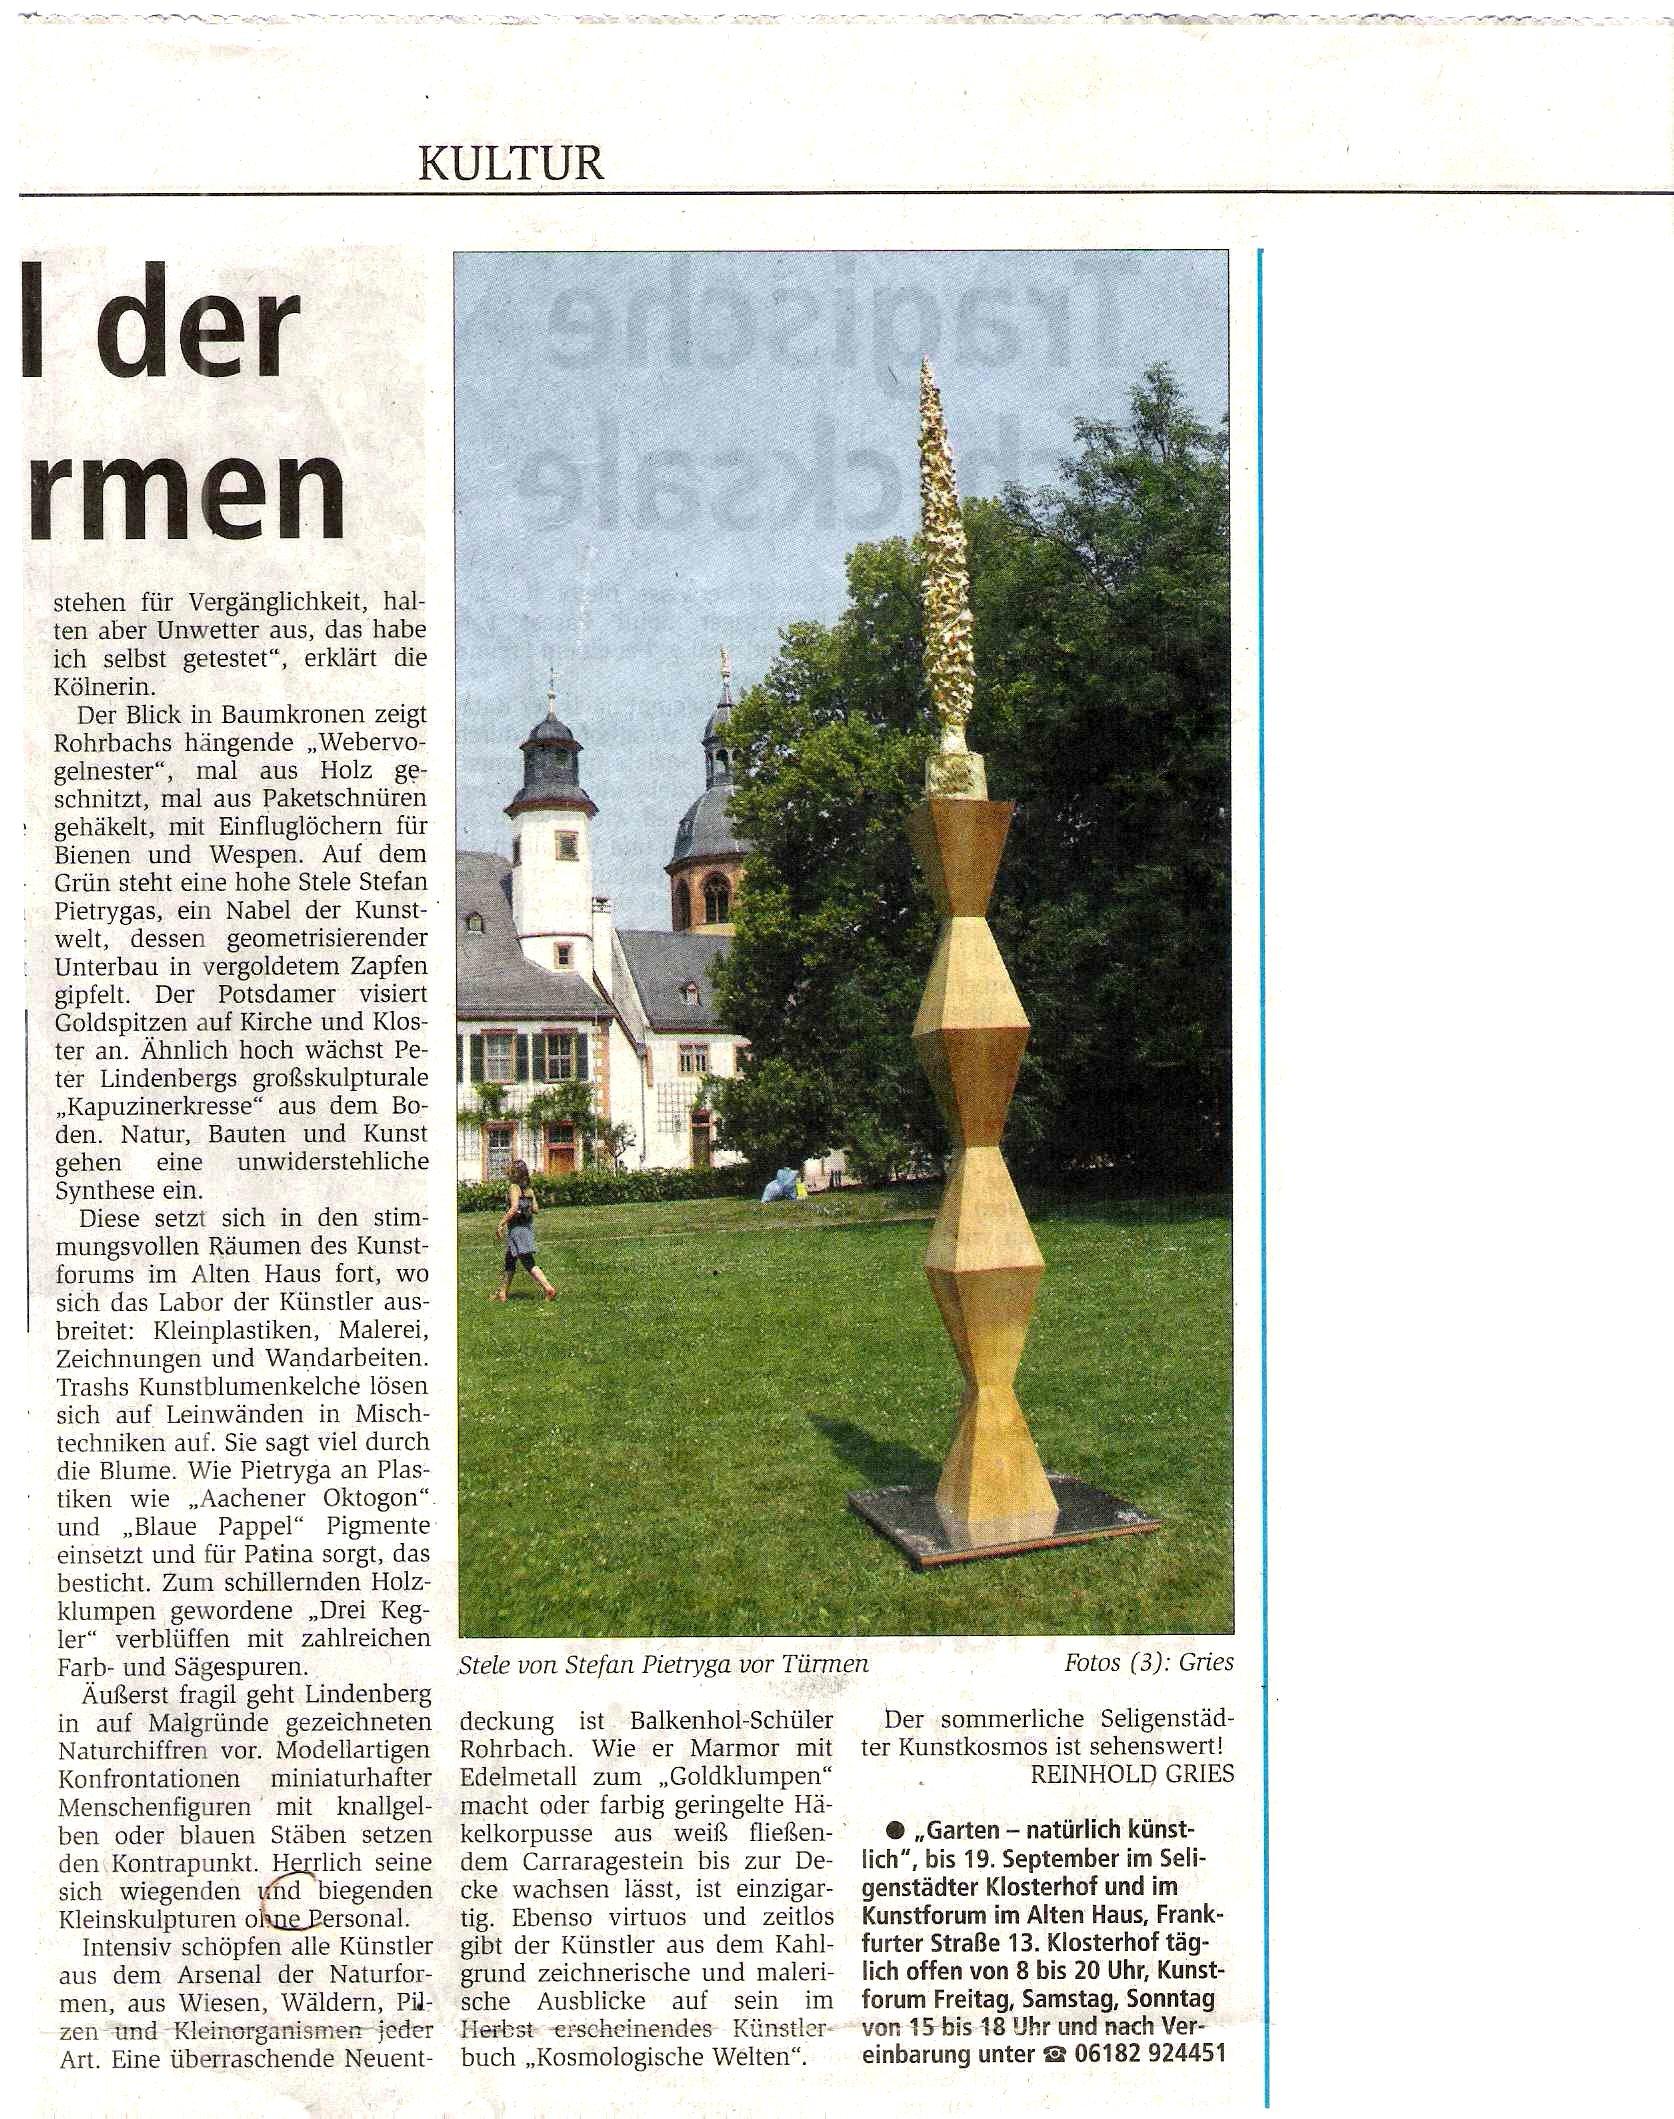 Artikel II Offenbach Post 6.7.2010